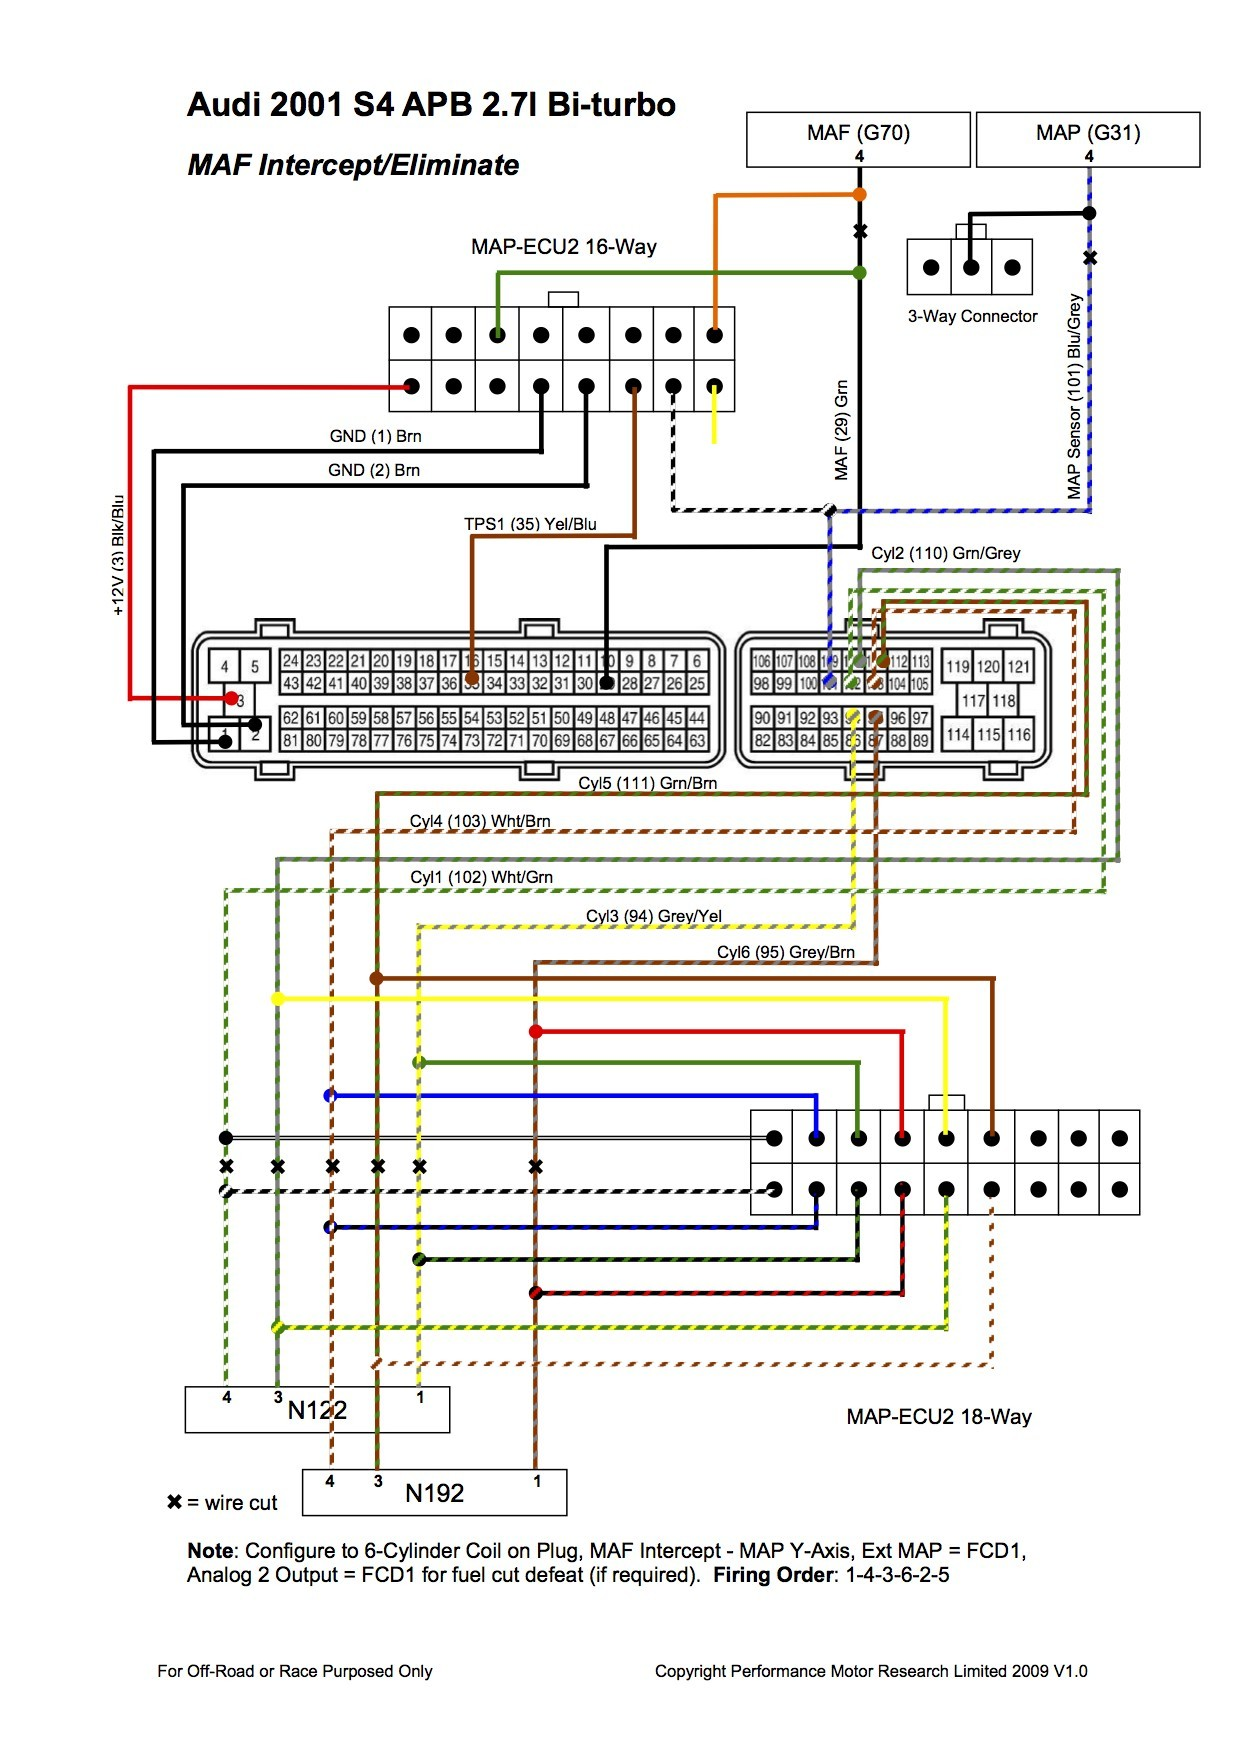 2006 dodge radio wiring diagram 2500 trusted wiring diagrams 2006 dodge ram radio wiring diagram new wiring diagram image 2006 dodge ram 1500 radio wiring diagram 2006 dodge radio wiring diagram 2500 asfbconference2016 Choice Image